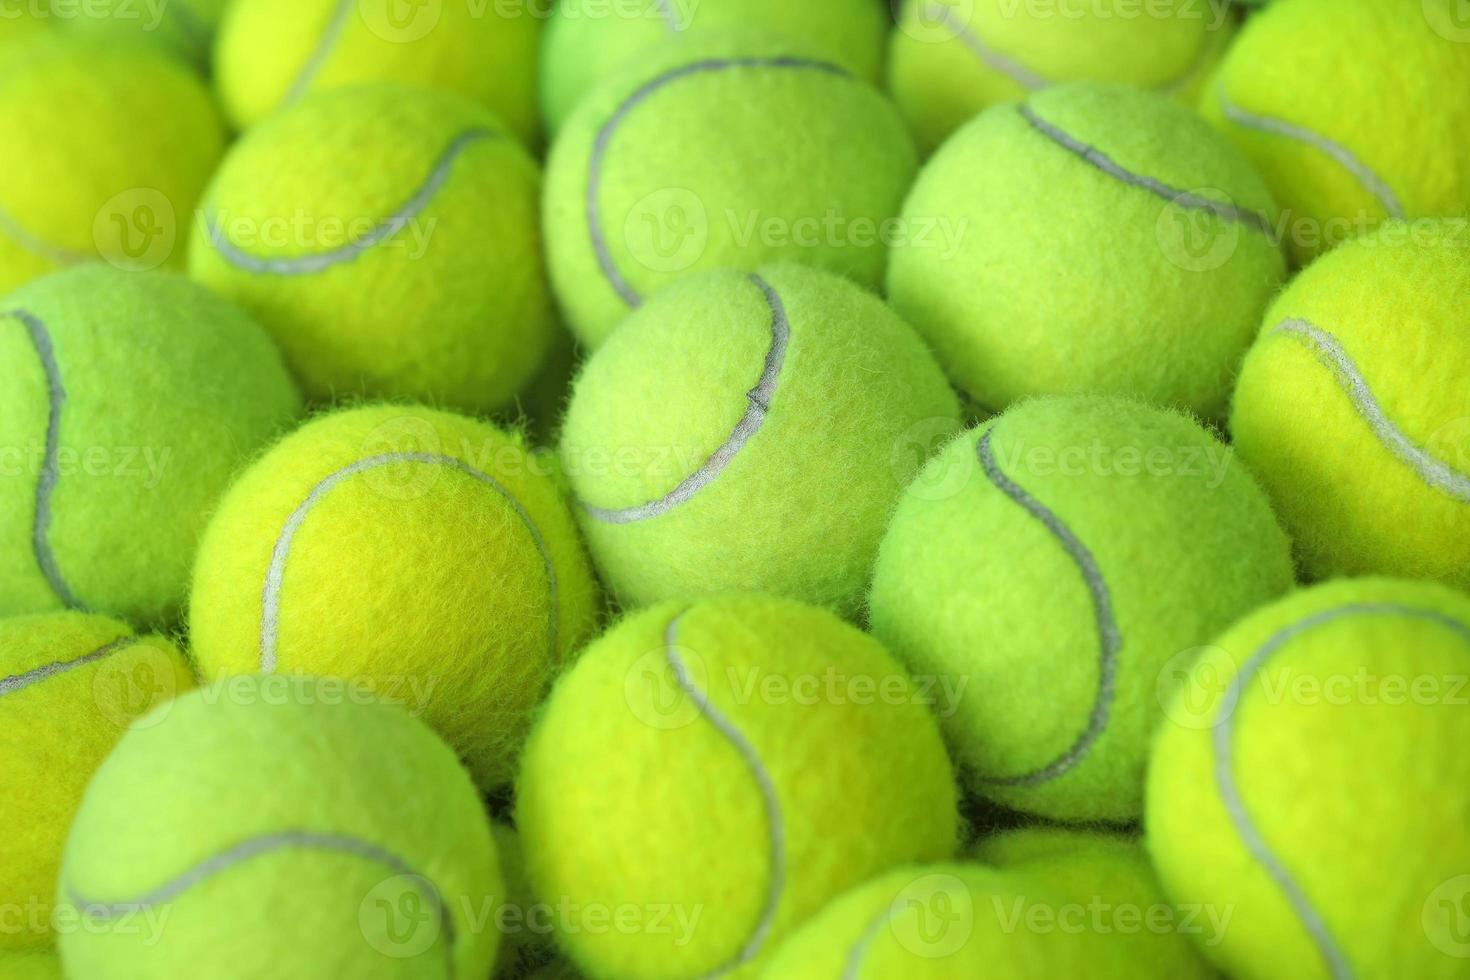 tennisbal als sportachtergrond foto